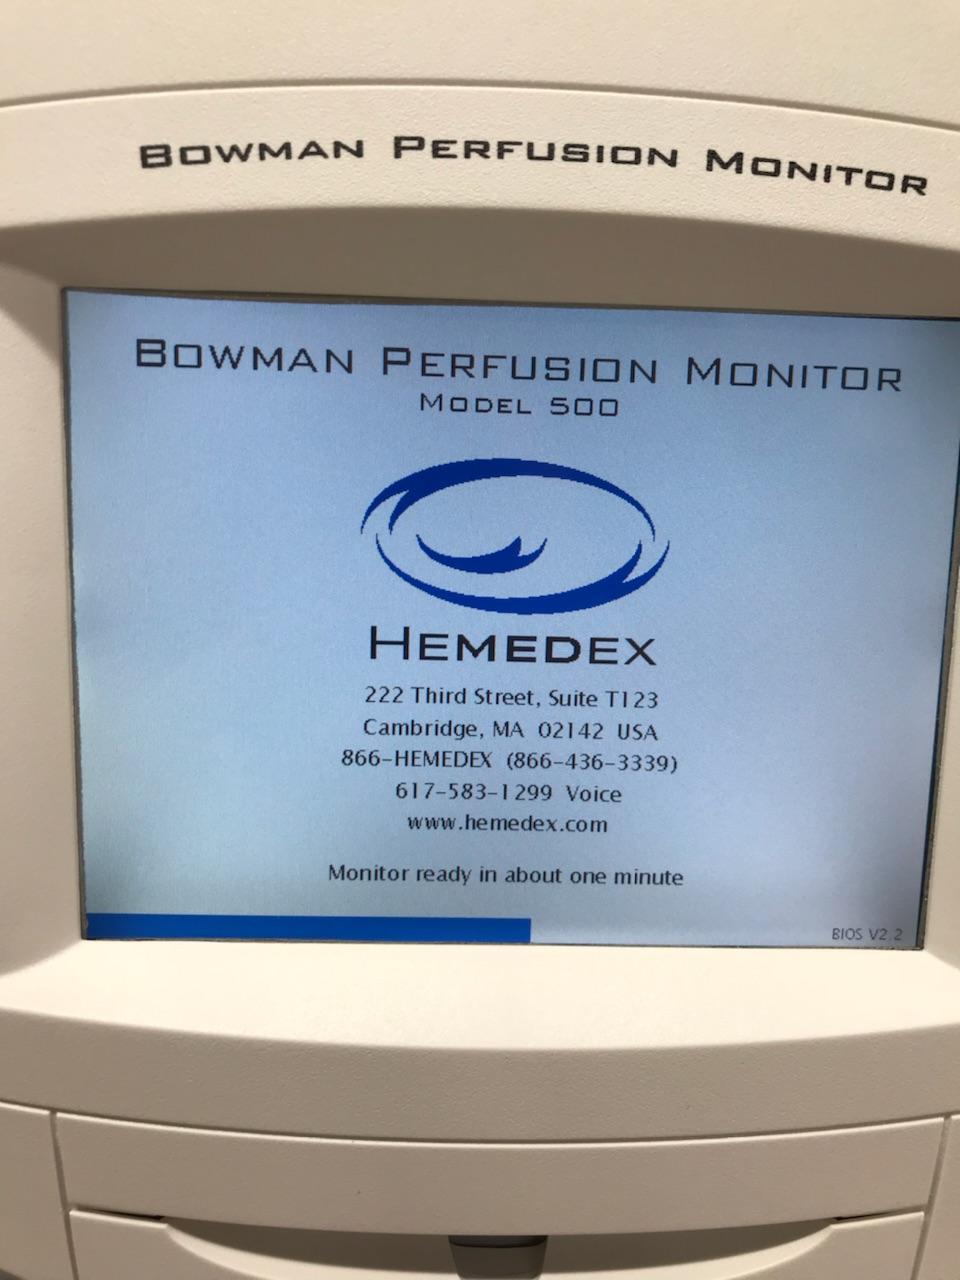 NEW Hemedex Bowman Perfusion Monitor Model 500